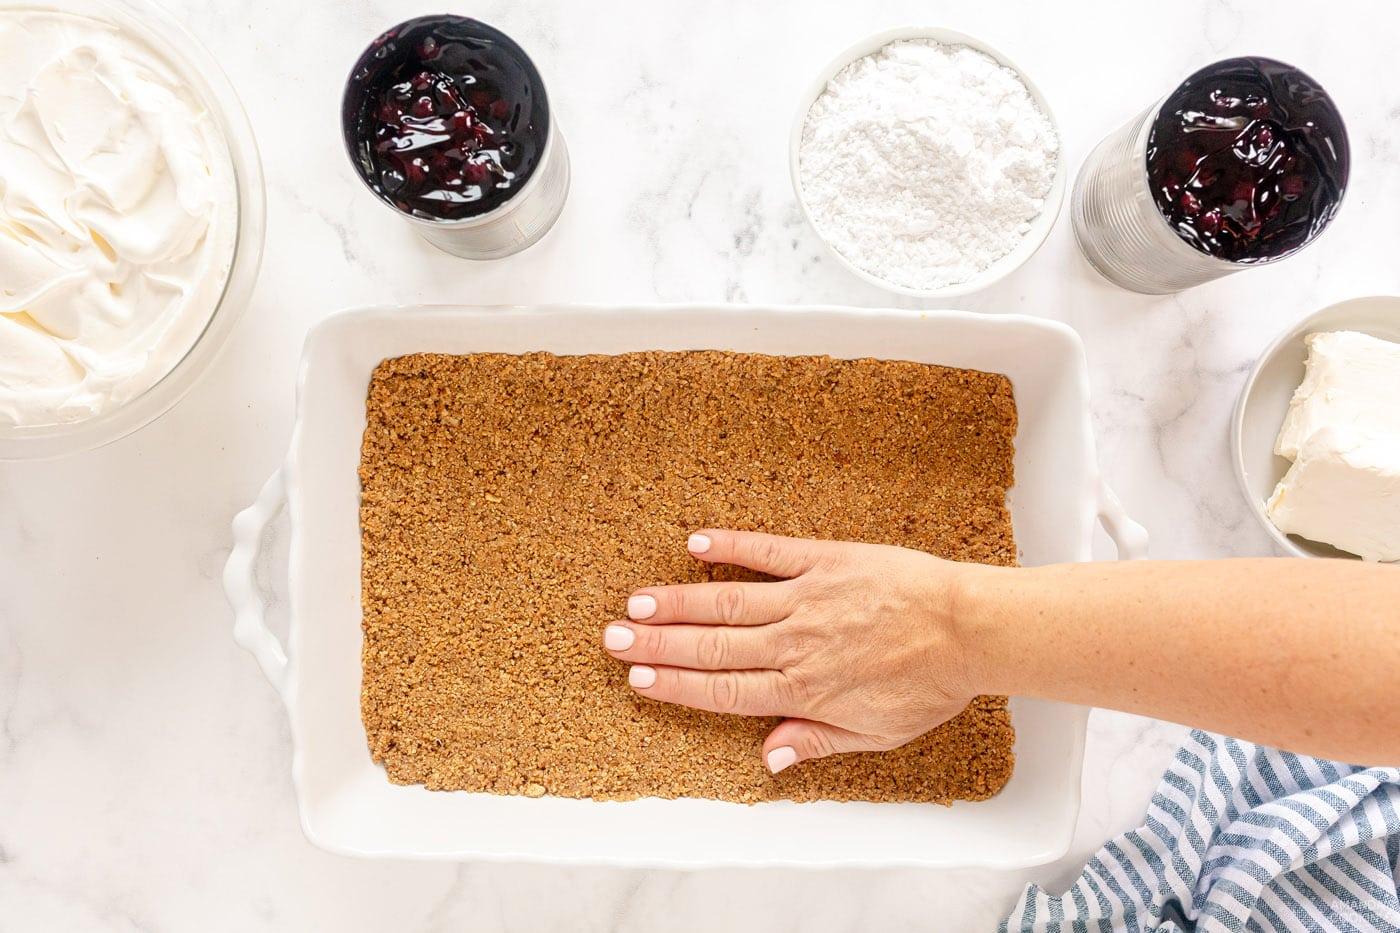 pressing graham cracker crust into pan